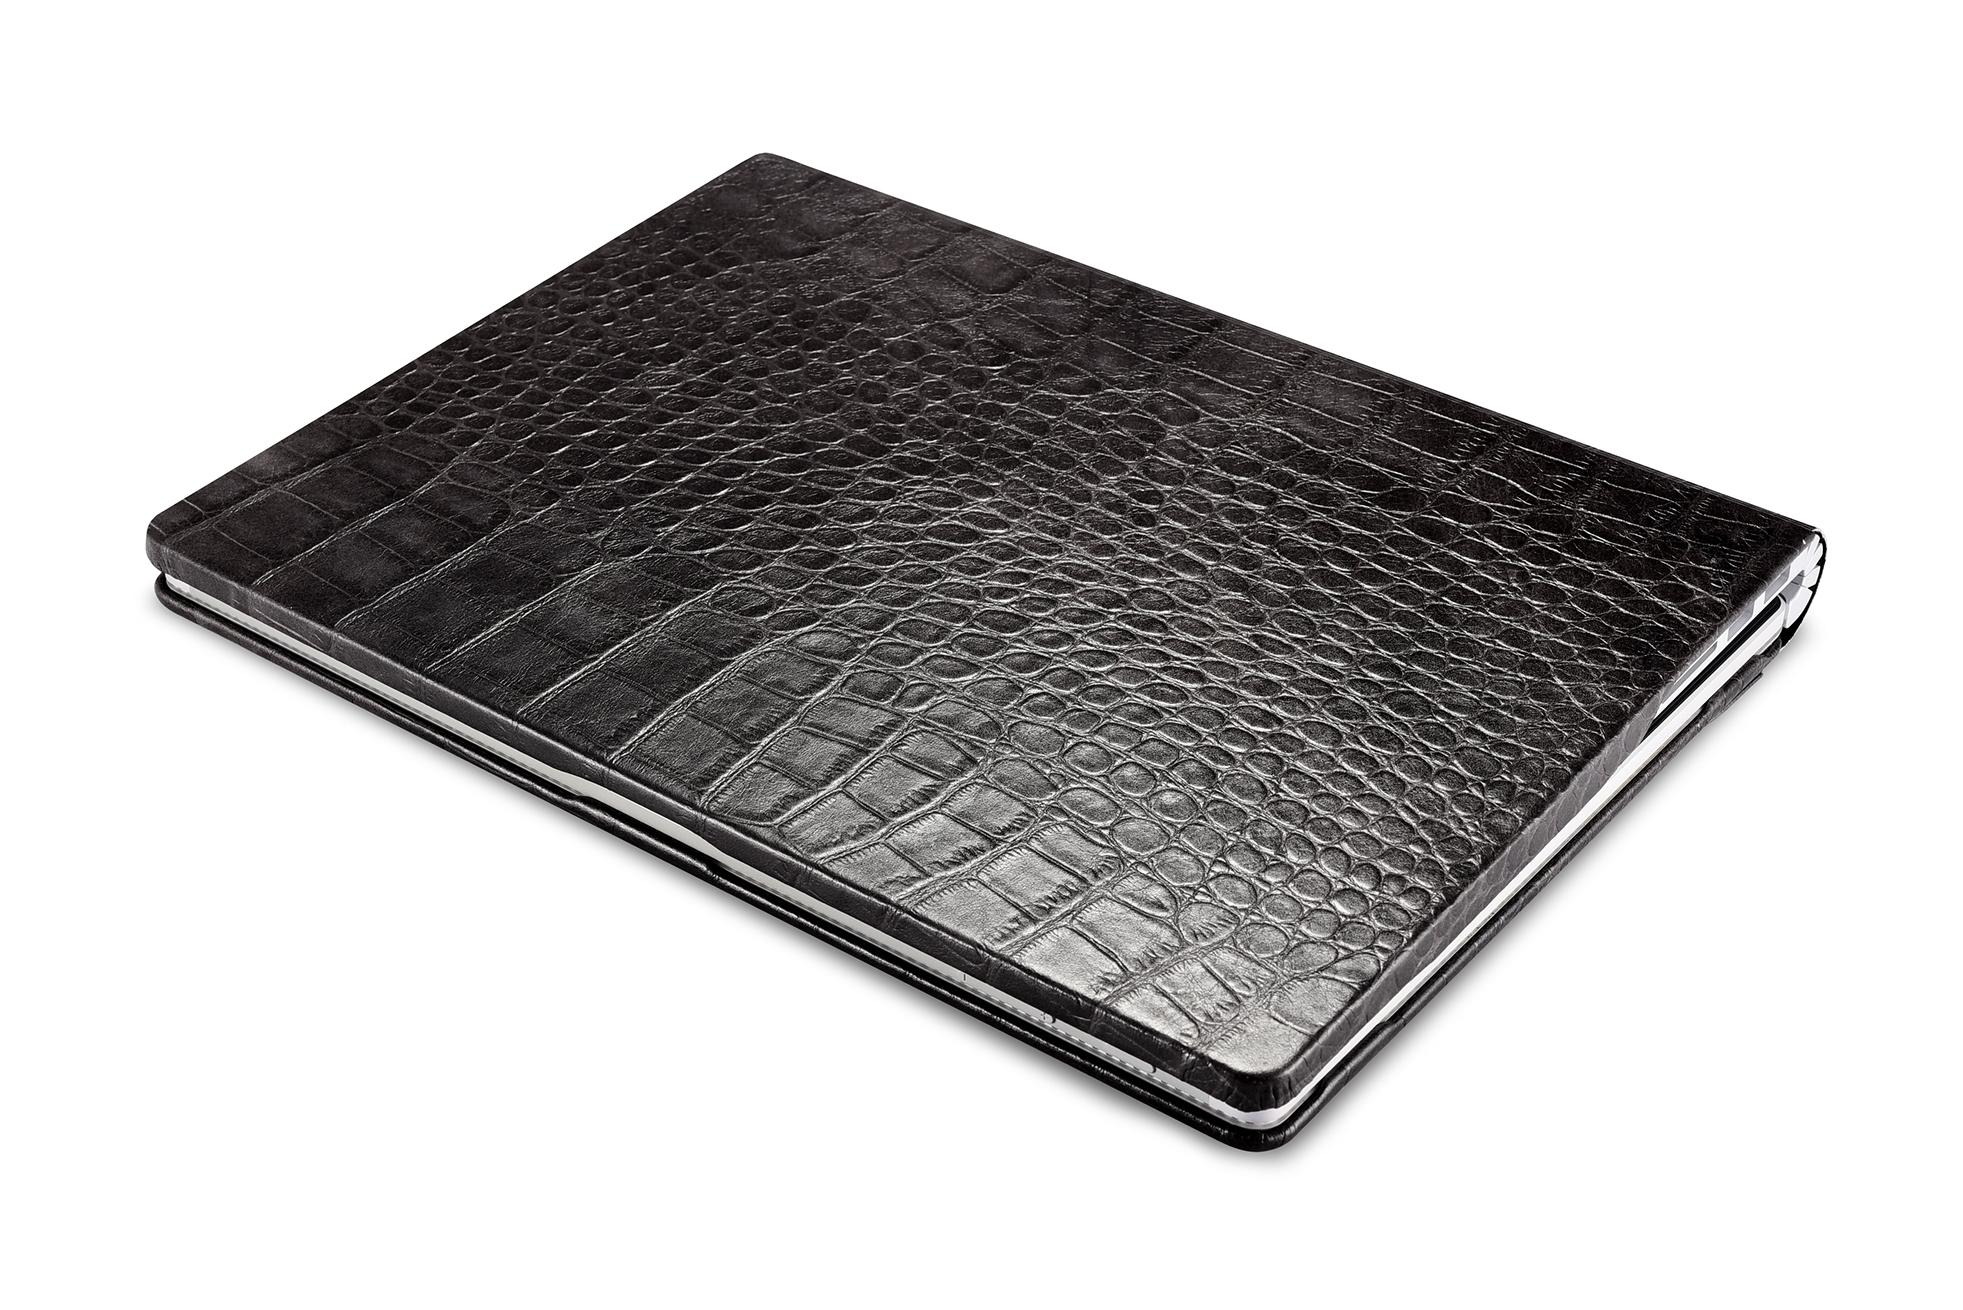 iCarer Surface Book Embossed Crocodile Genuine Leather Detachable Flip Case 16